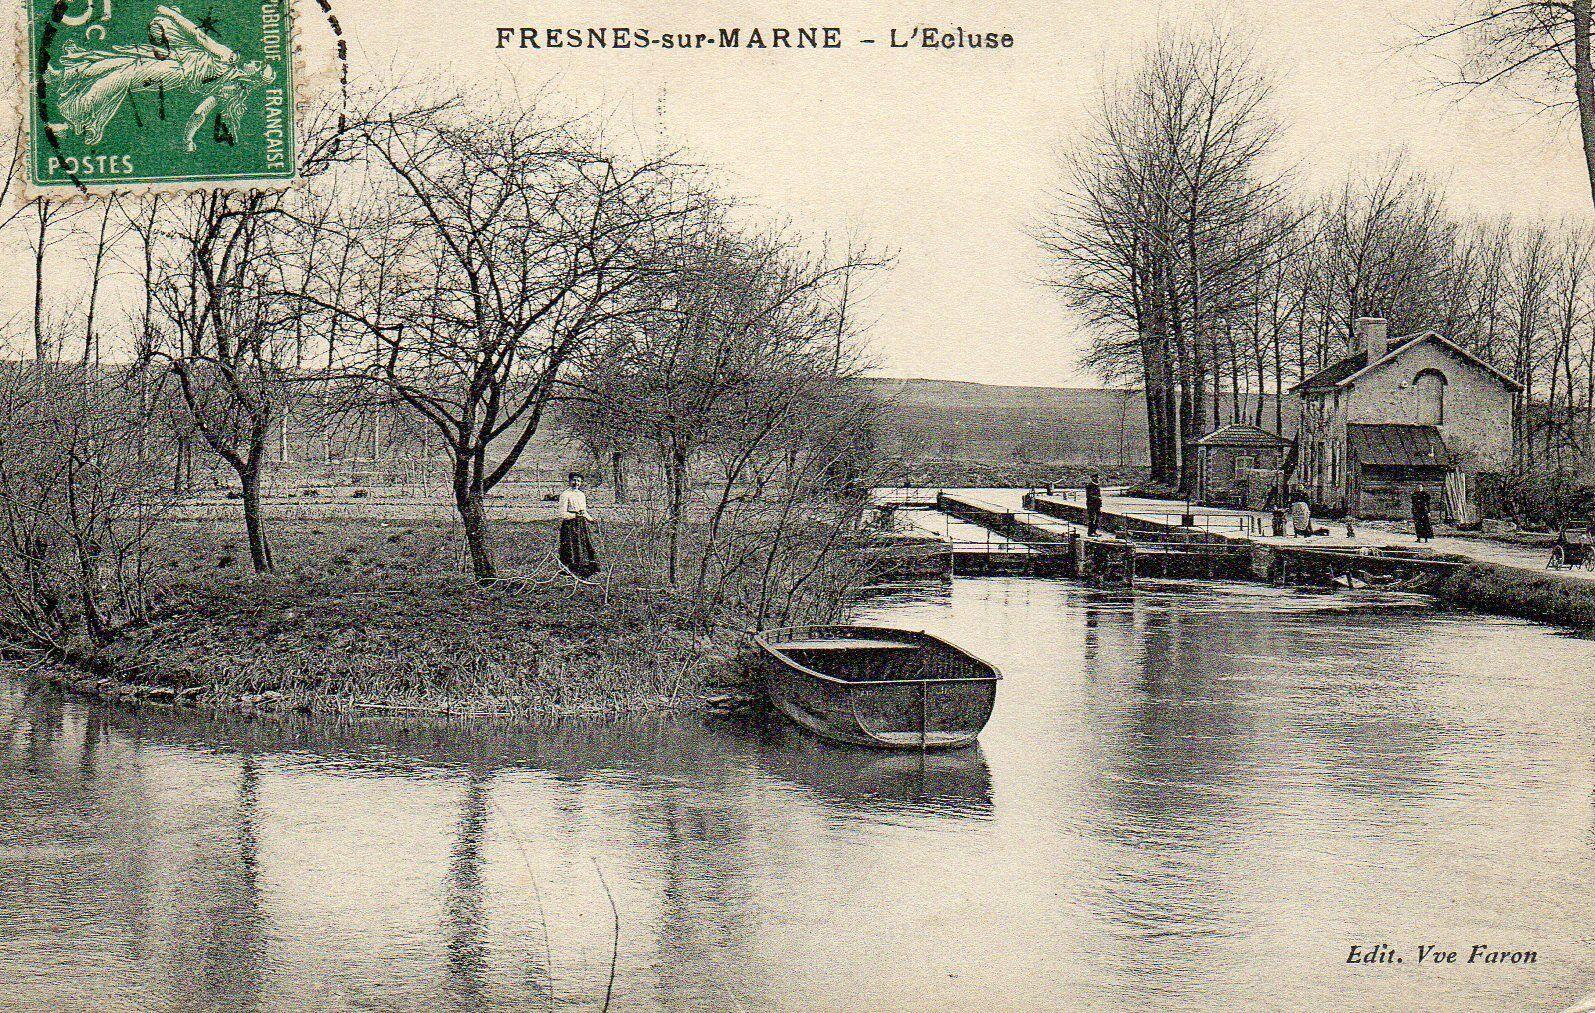 Fresnes